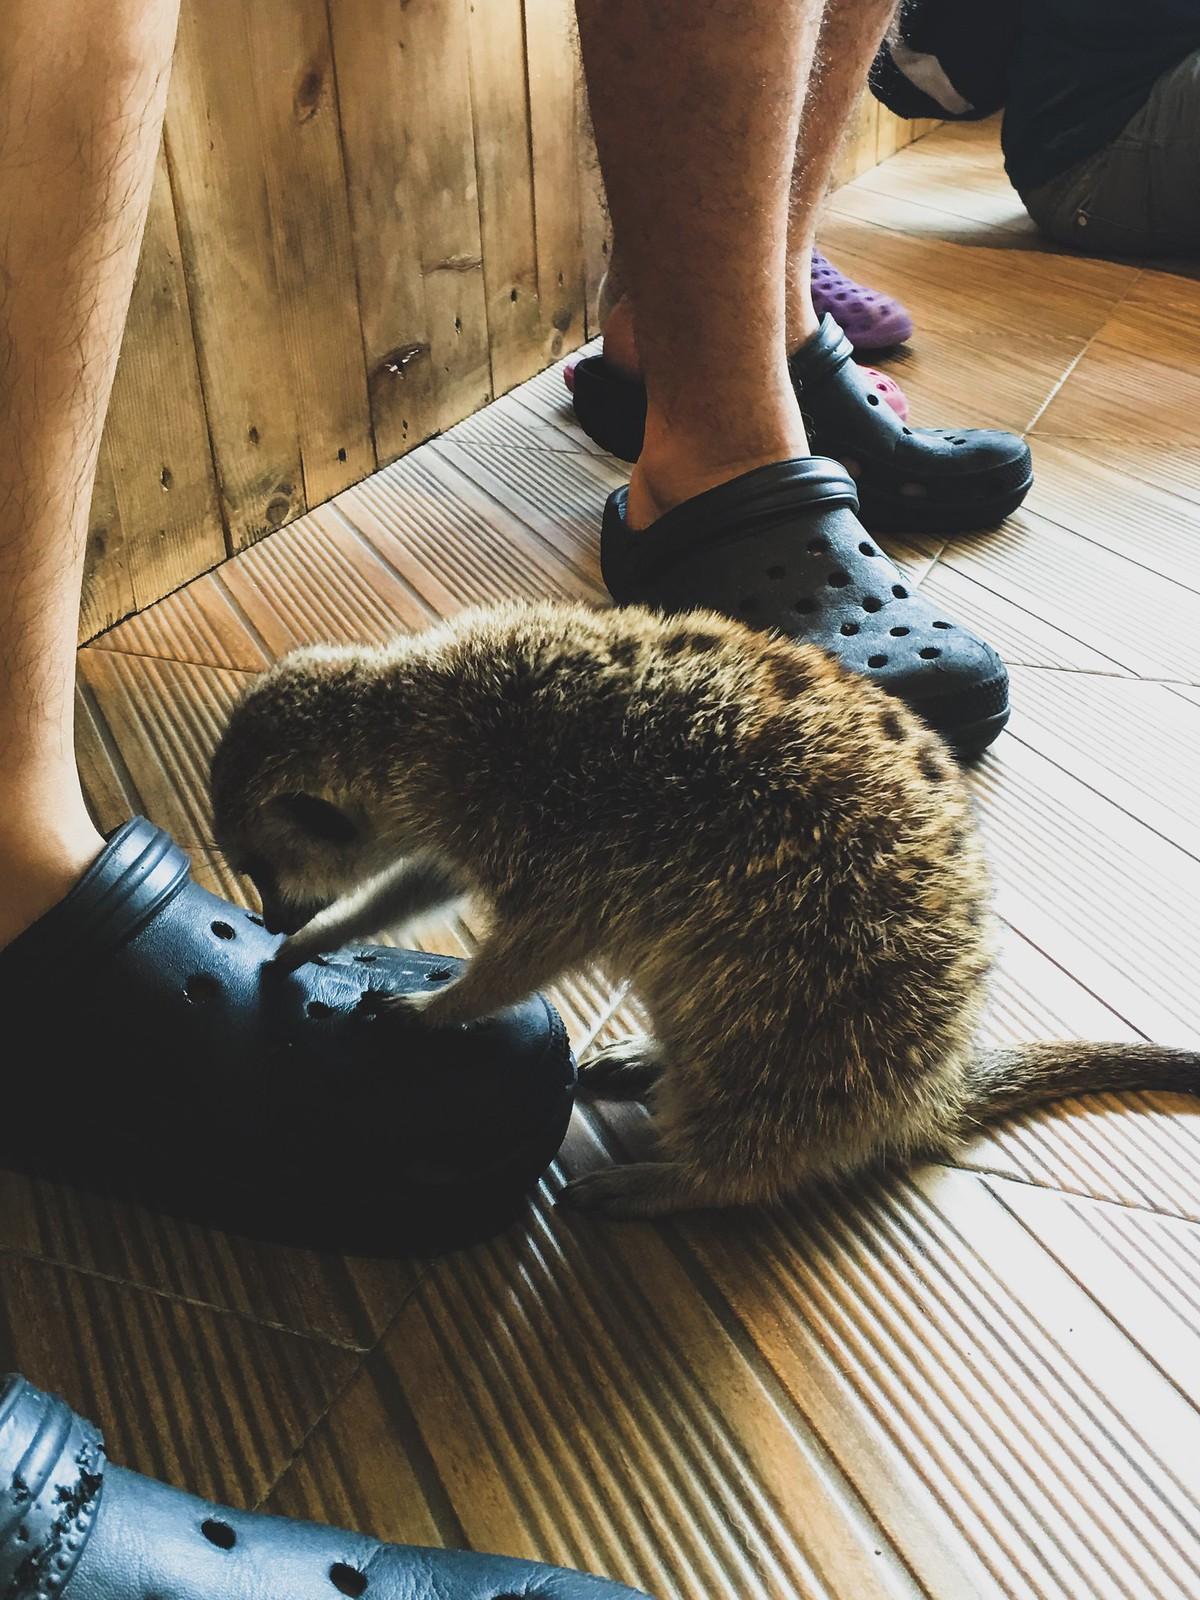 2016 Bangkok Trip   Little Zoo Cafe   On The River Cafe   Thailand Luk Chup Lesson In Bangkok